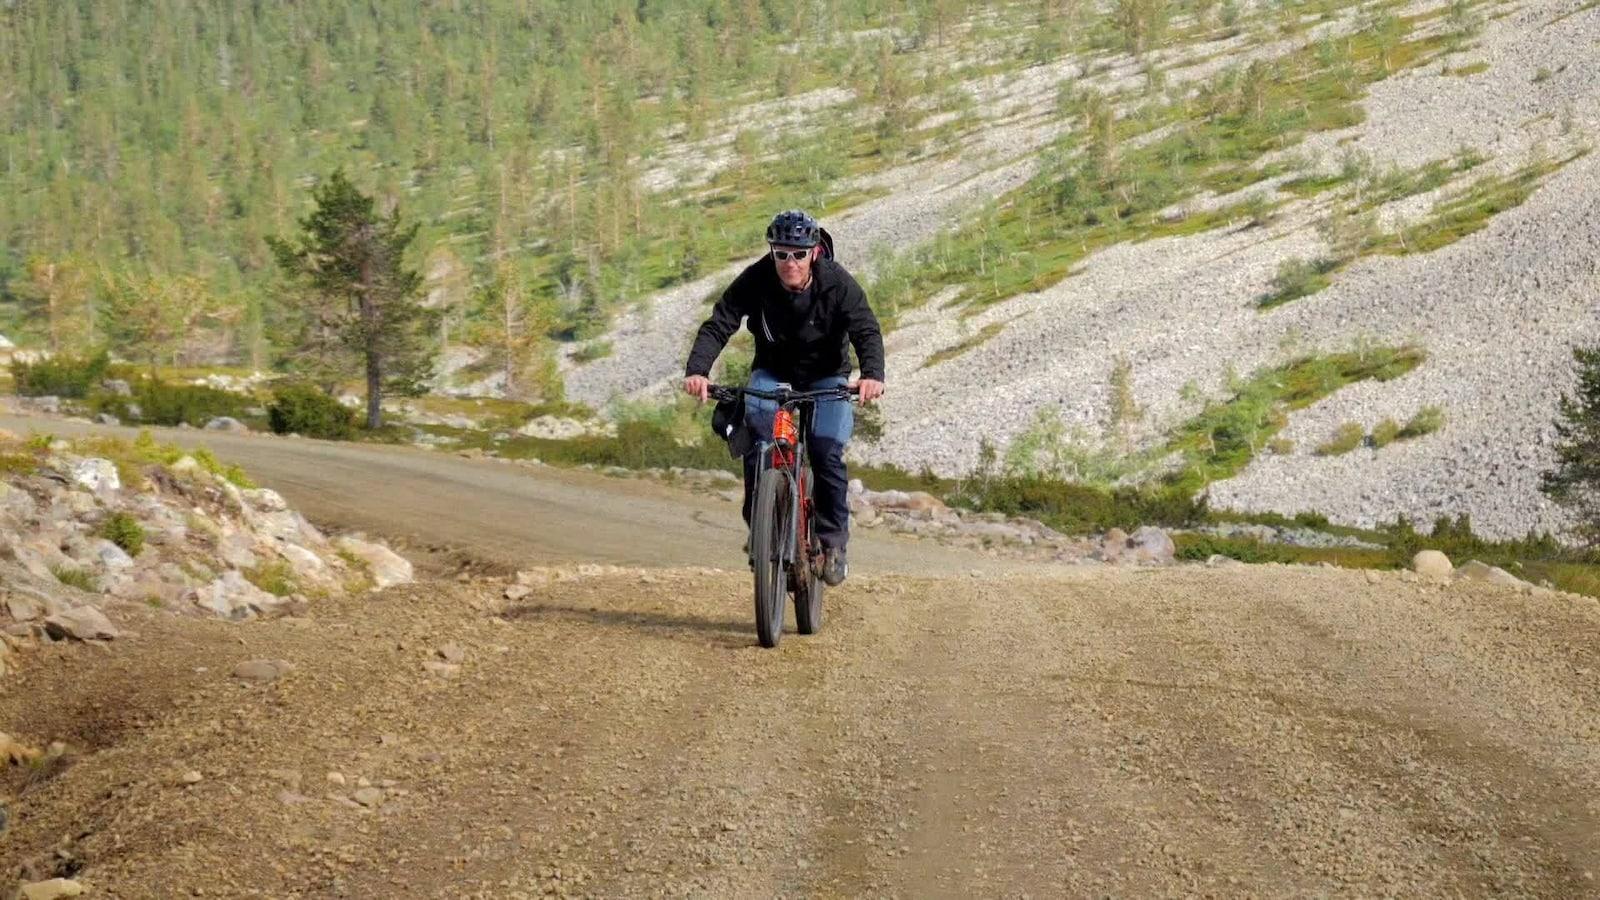 Alpeilla: Biking and hiking